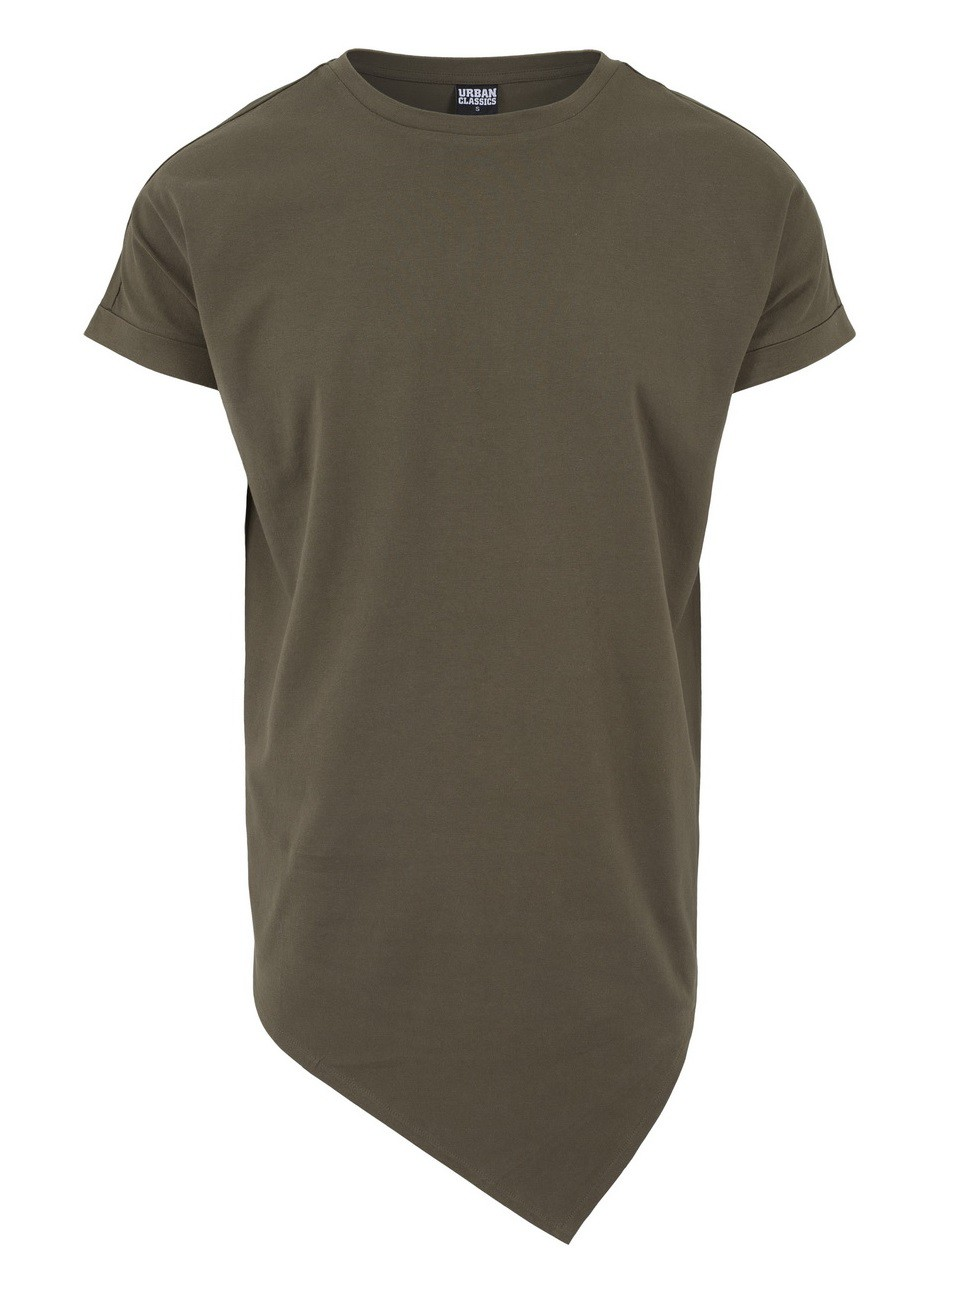 850ccd6f2e5c Urban Classics Herren Asymetric Long T-Shirt kaufen - JEANS-DIRECT.DE